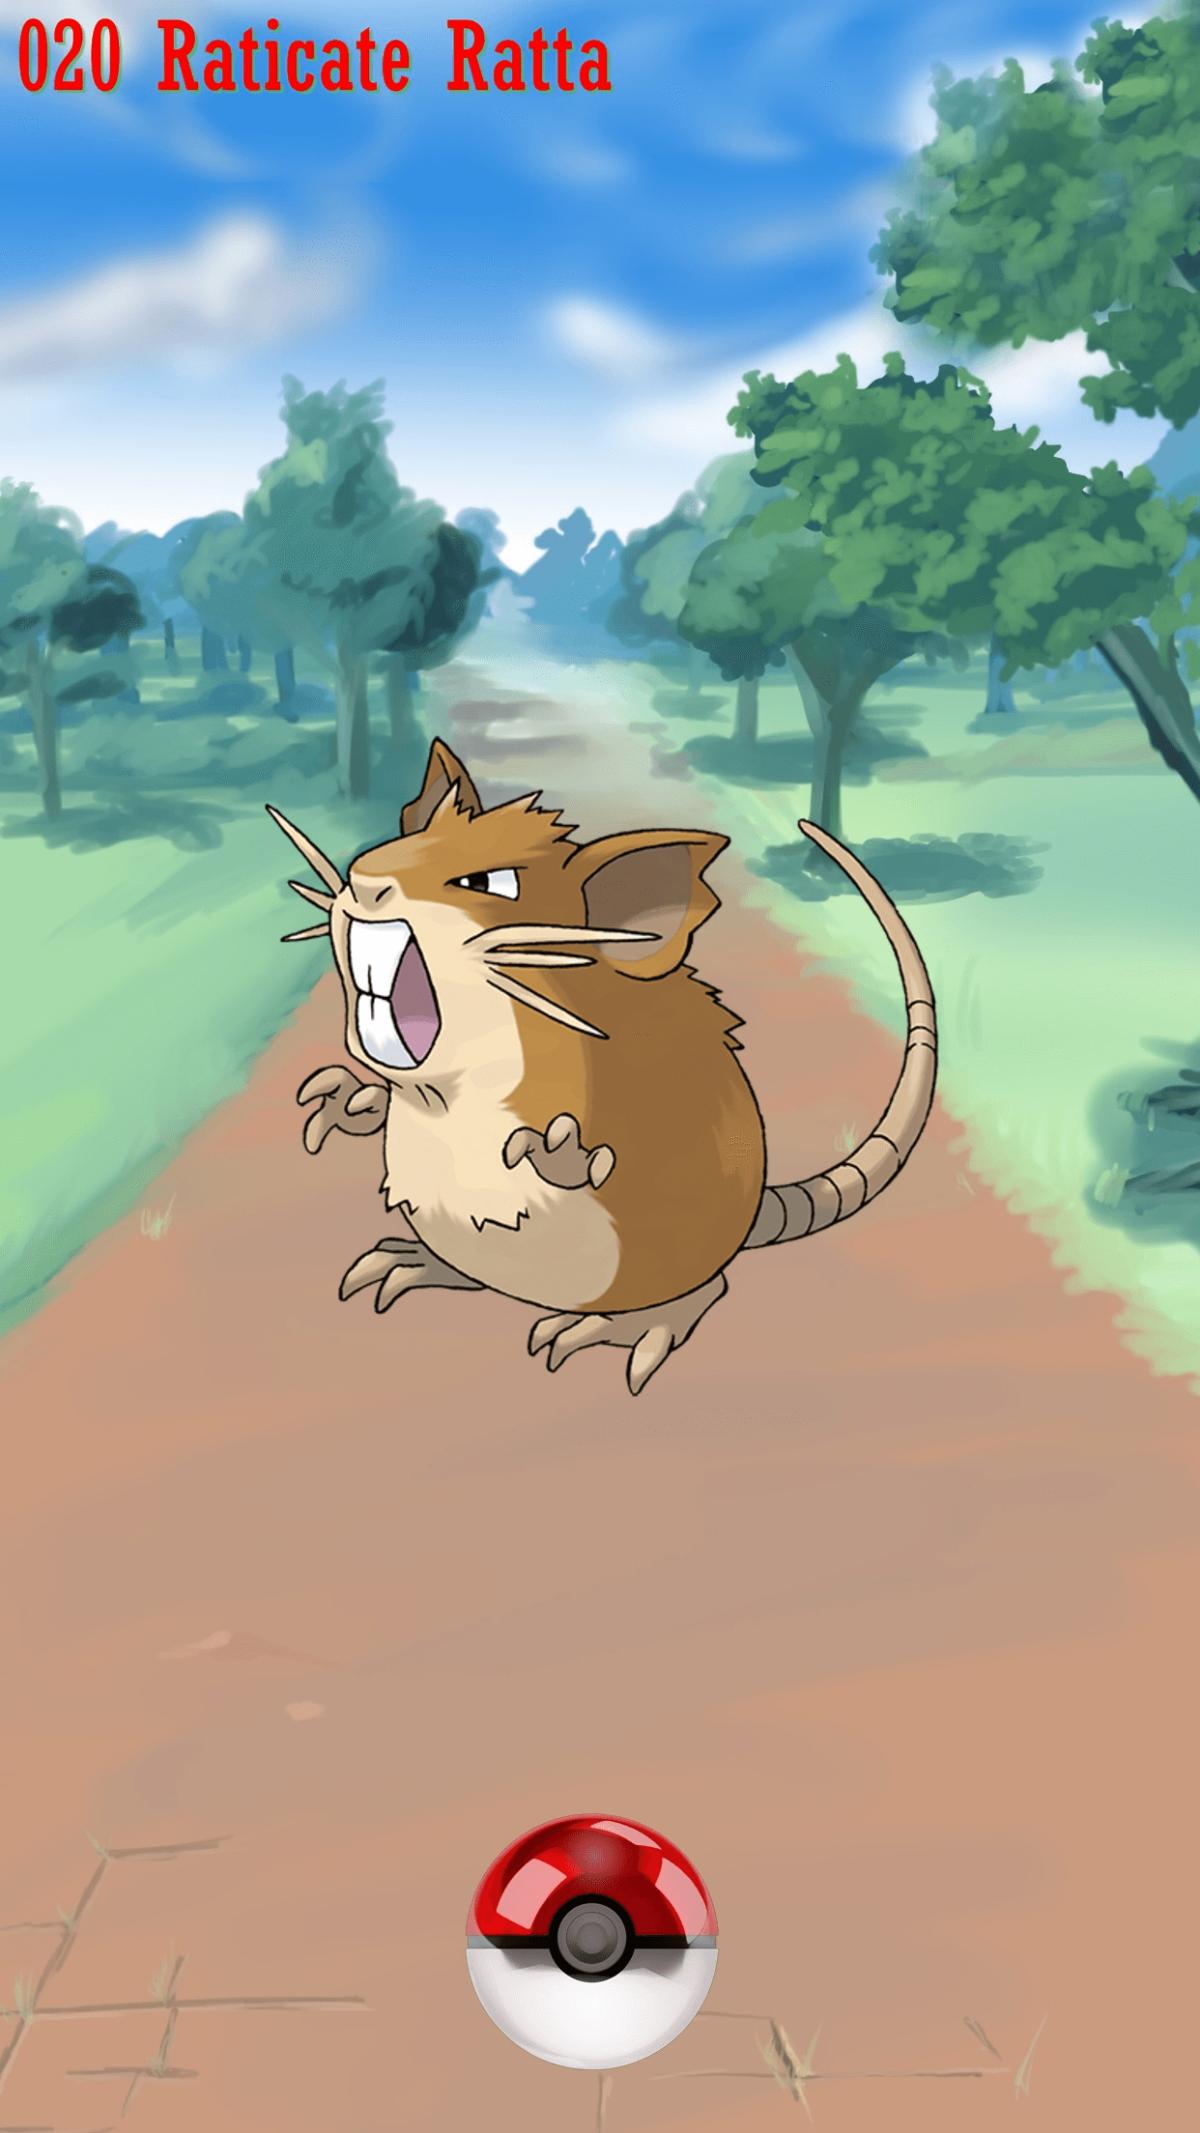 020 Street Pokeball Raticate Ratta | Wallpaper